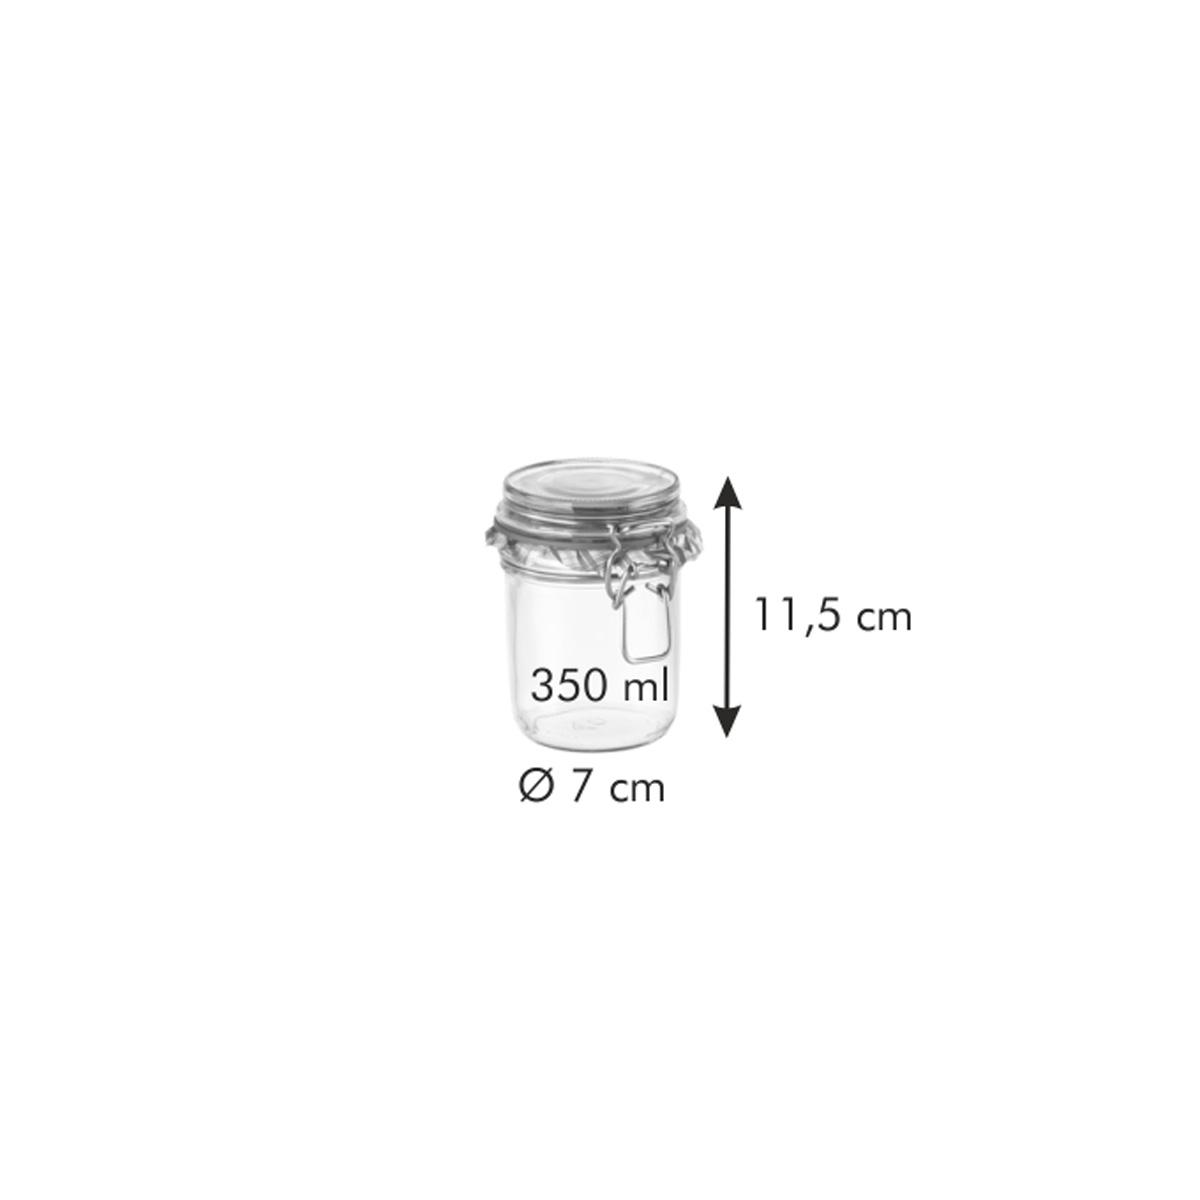 Zavařovací sklenice s klipem TESCOMA DELLA CASA 350 ml